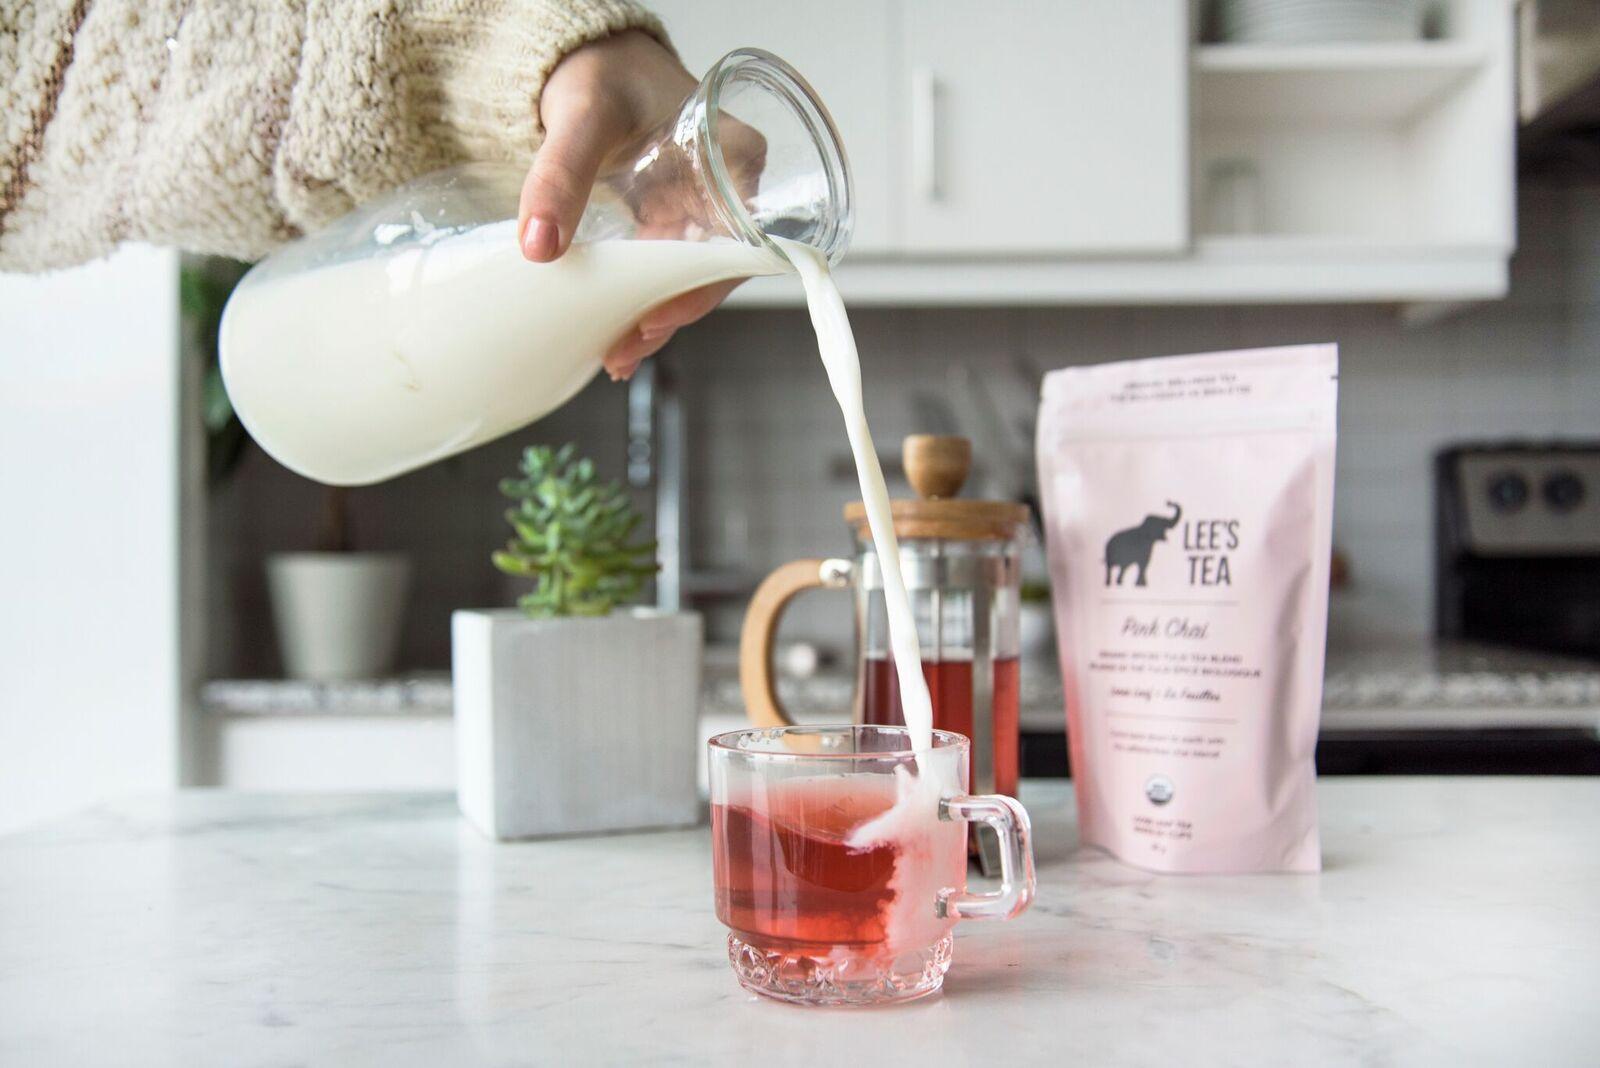 Wellness Tea 101 with Lee from Lee's Tea - Lee's Tea Product in Kitchen